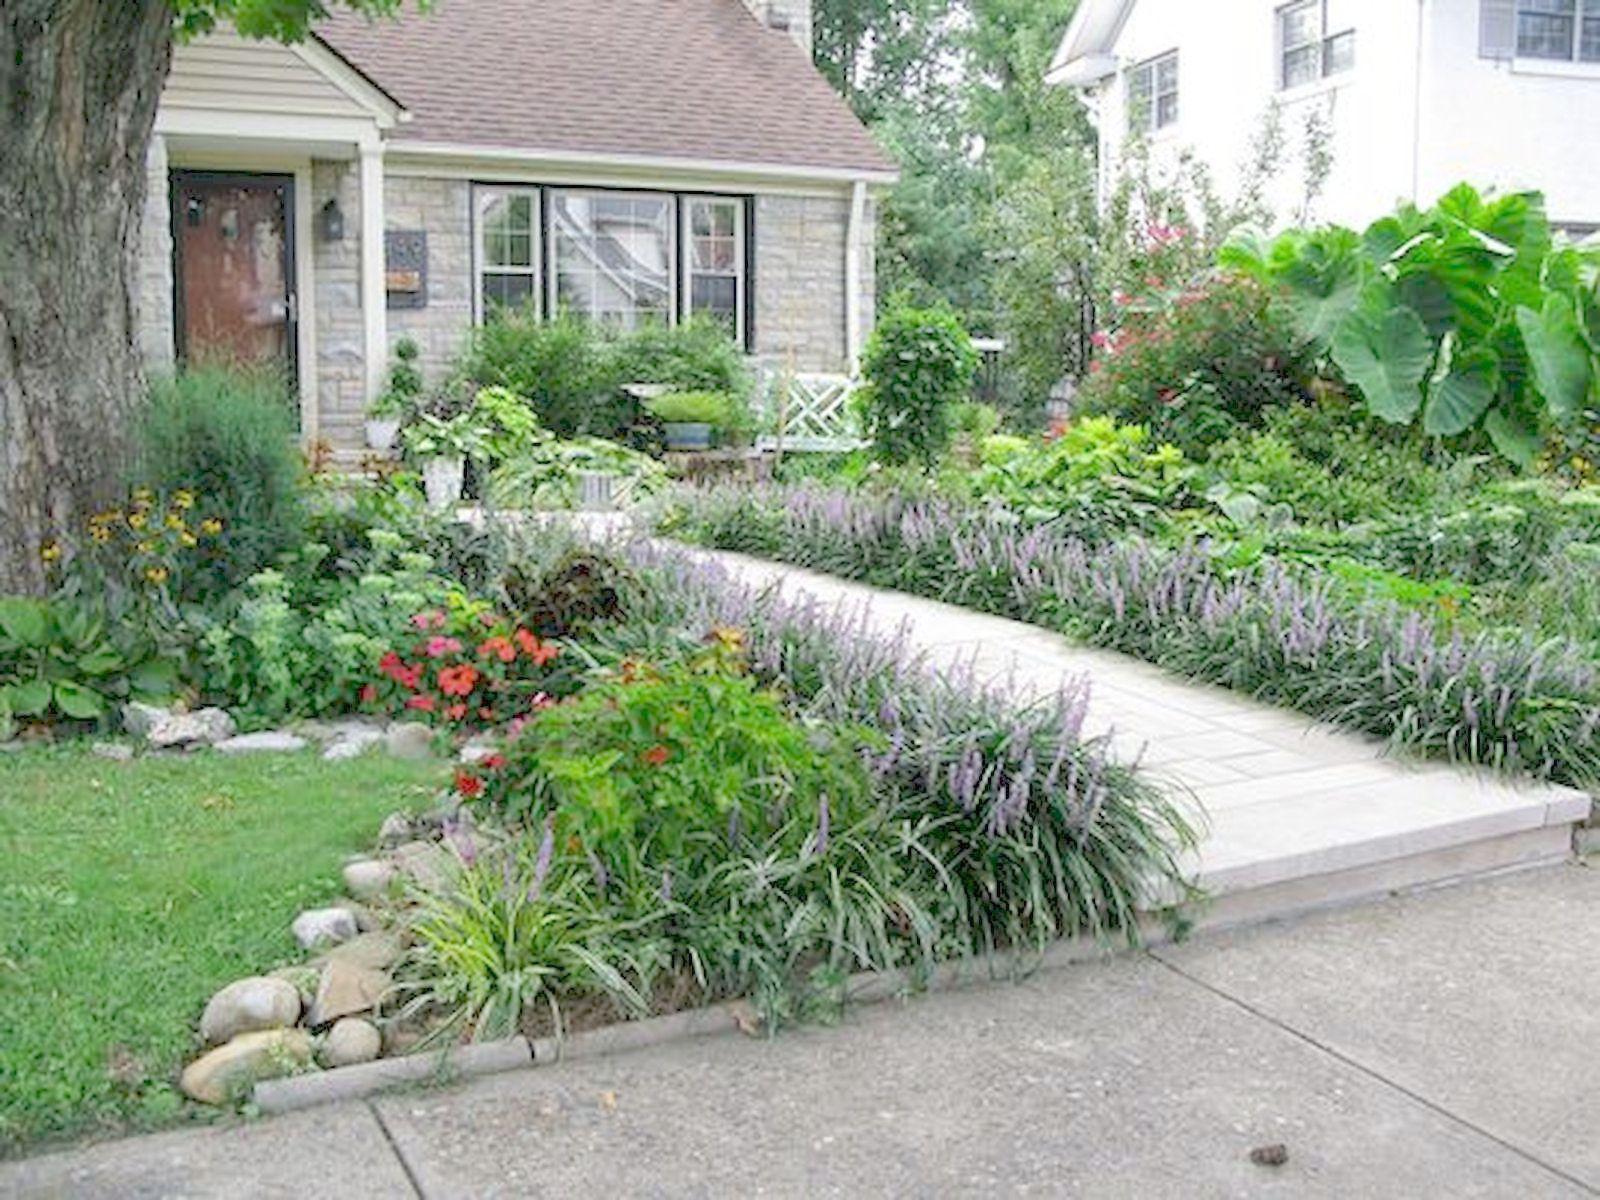 Landscape Gardening Harrogate of Landscape Gardening Telford lest